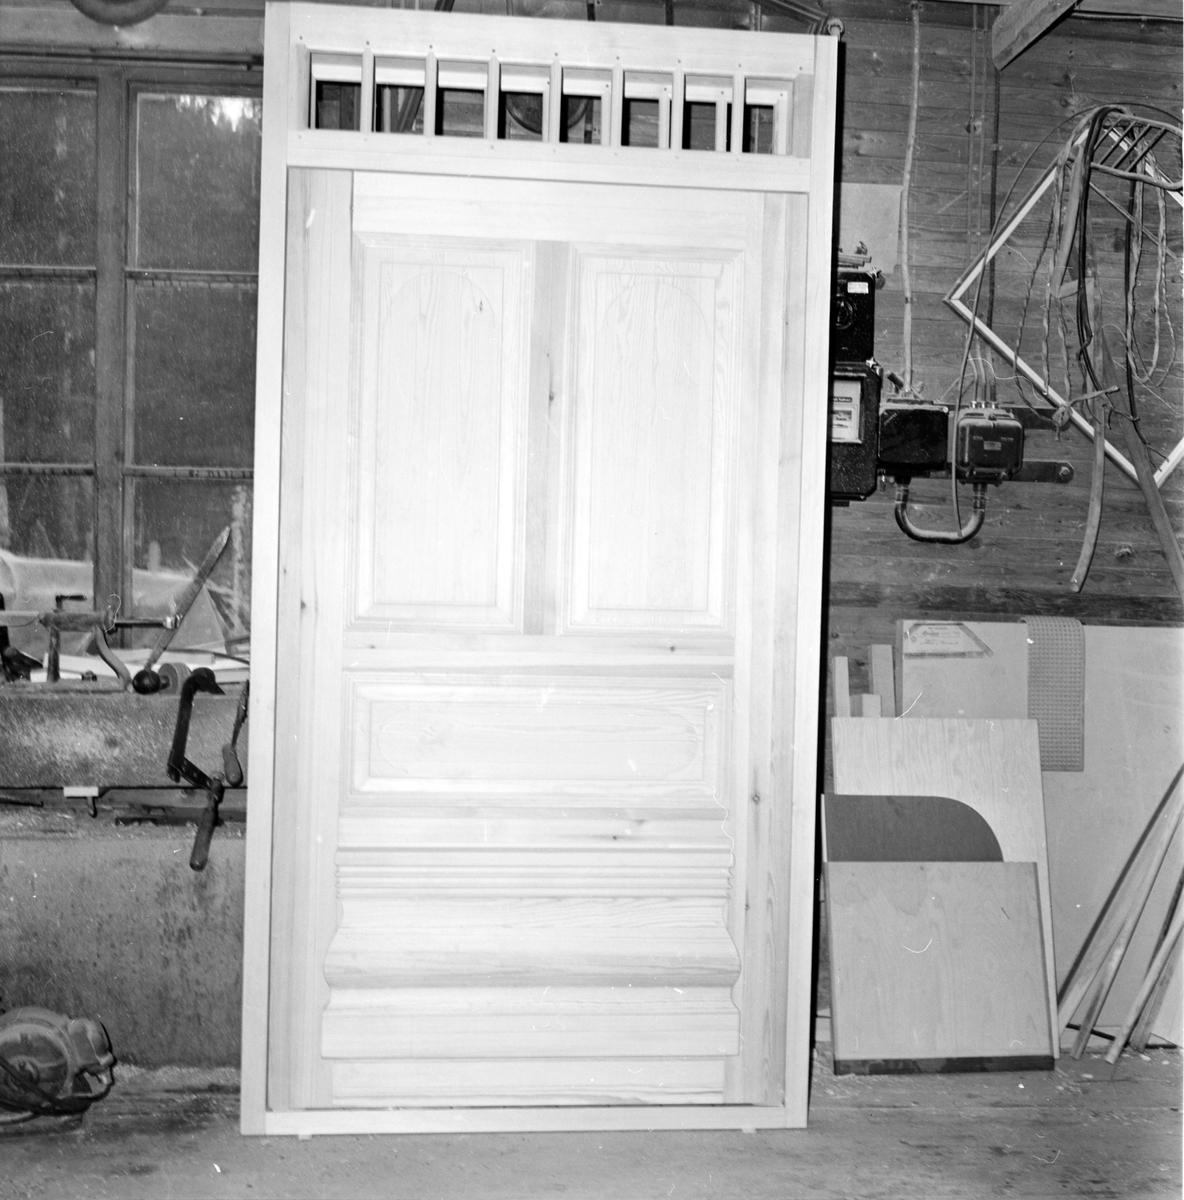 Simeå, Snickeriet Lewerentz, Två fina dörrar, November 1972